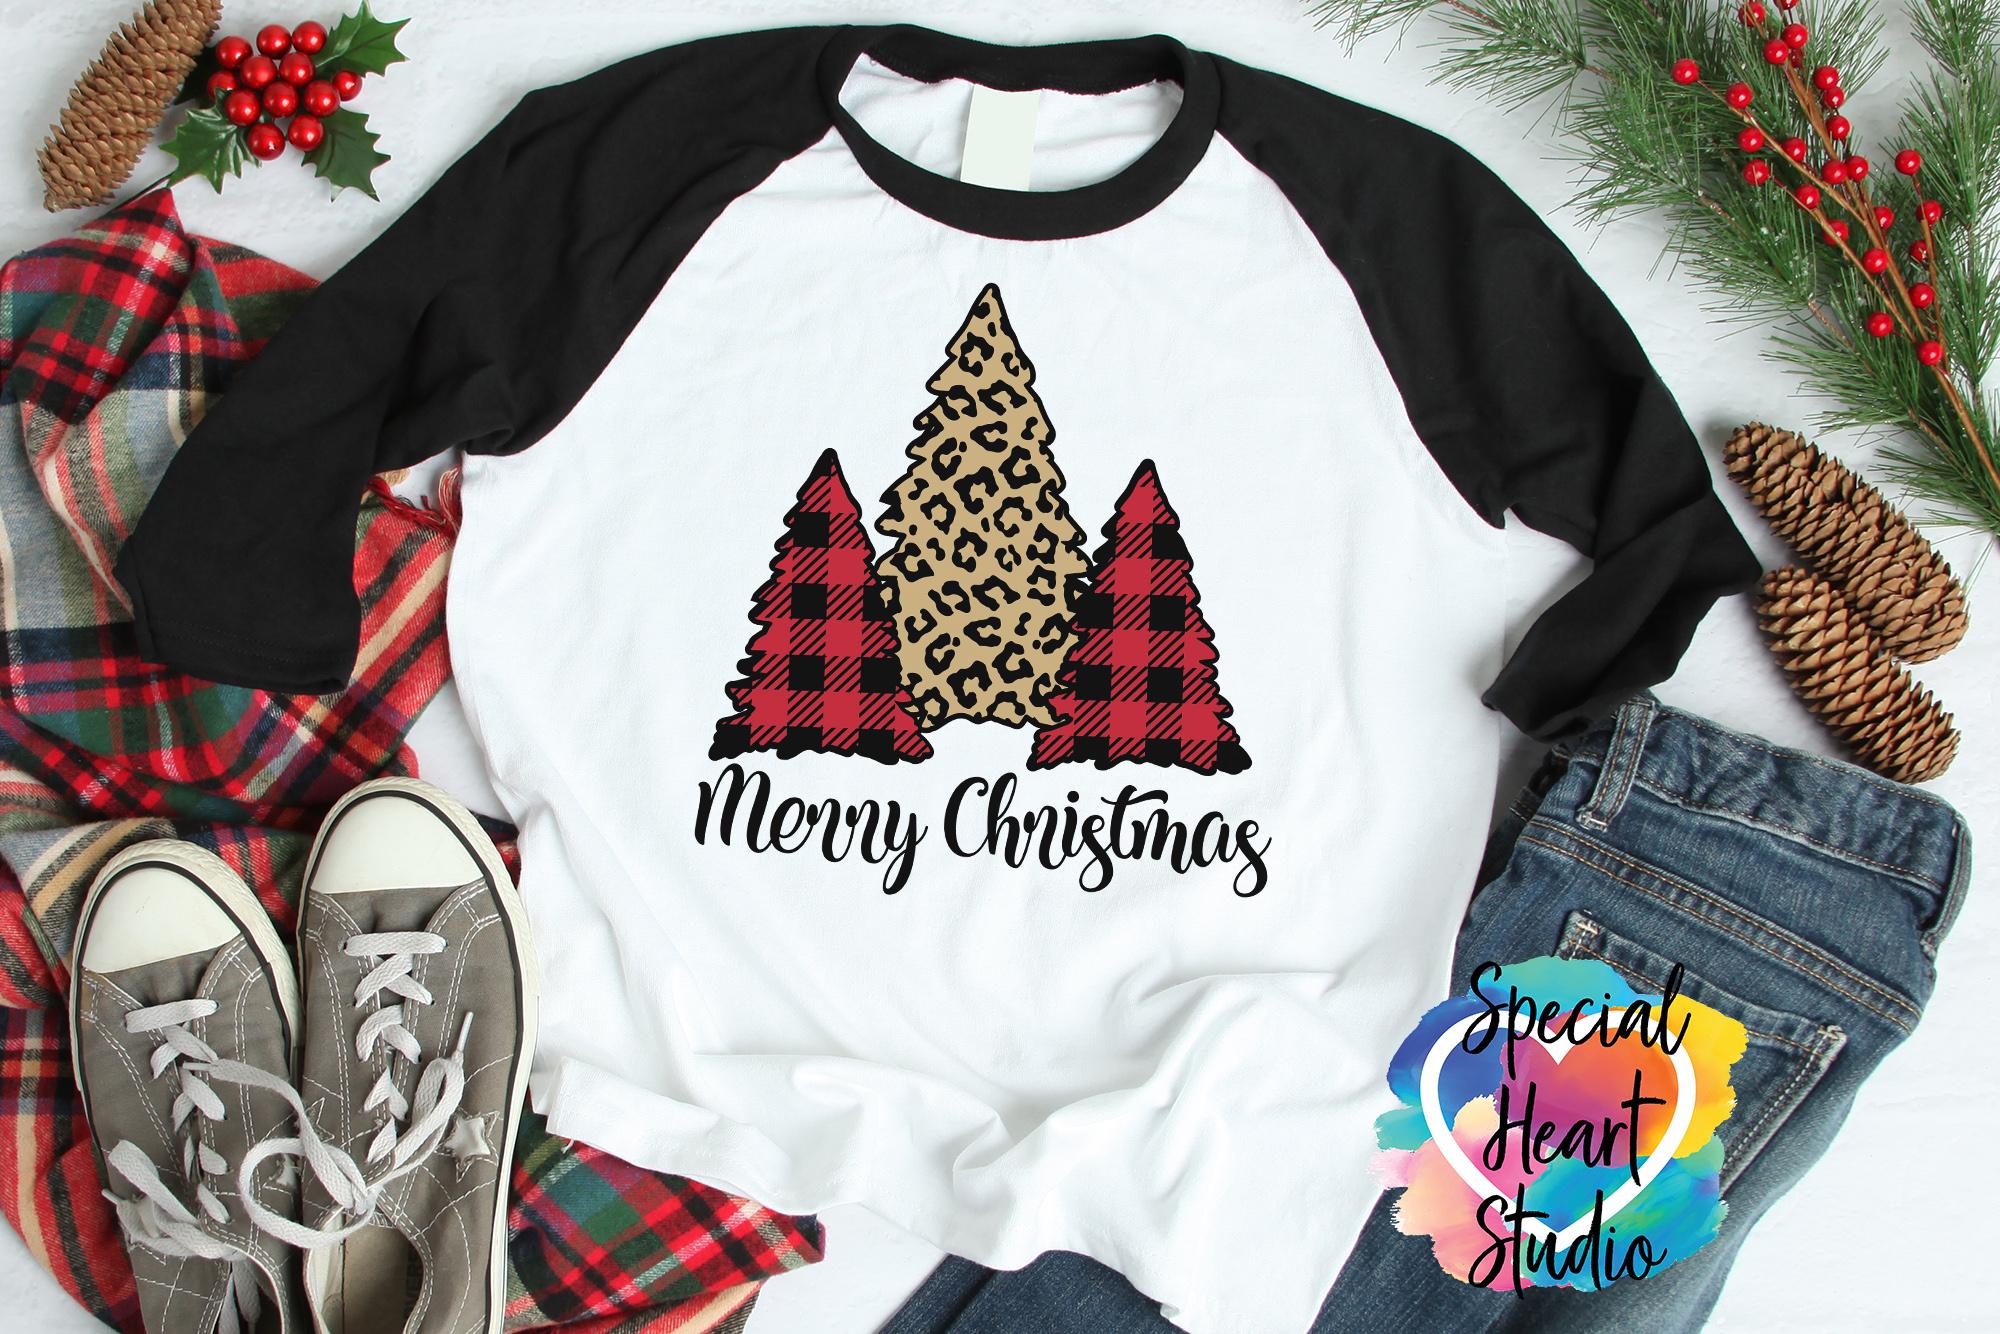 Christmas SVG Bundle - A Christmas Shirt SVG Cut File Bundle example image 6